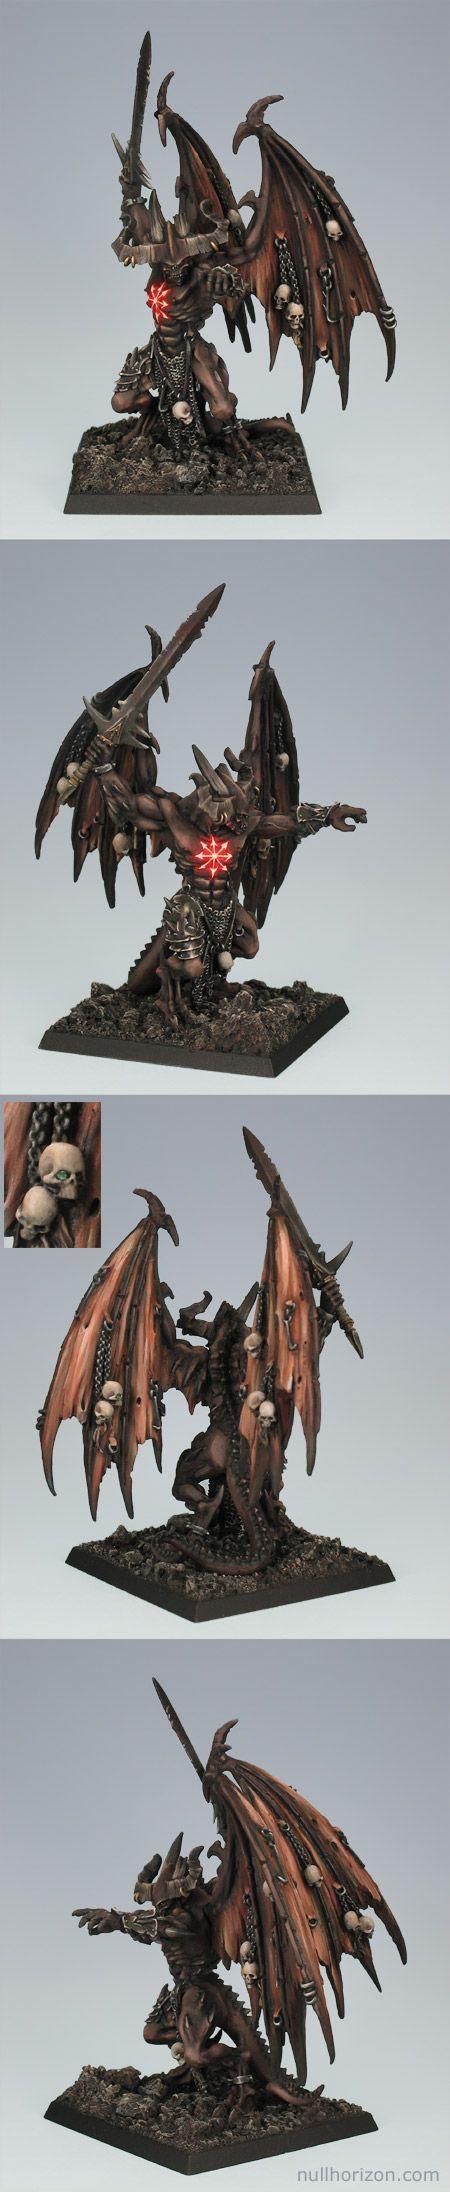 Be'Lakor, the Dark Master, Chaos Daemon